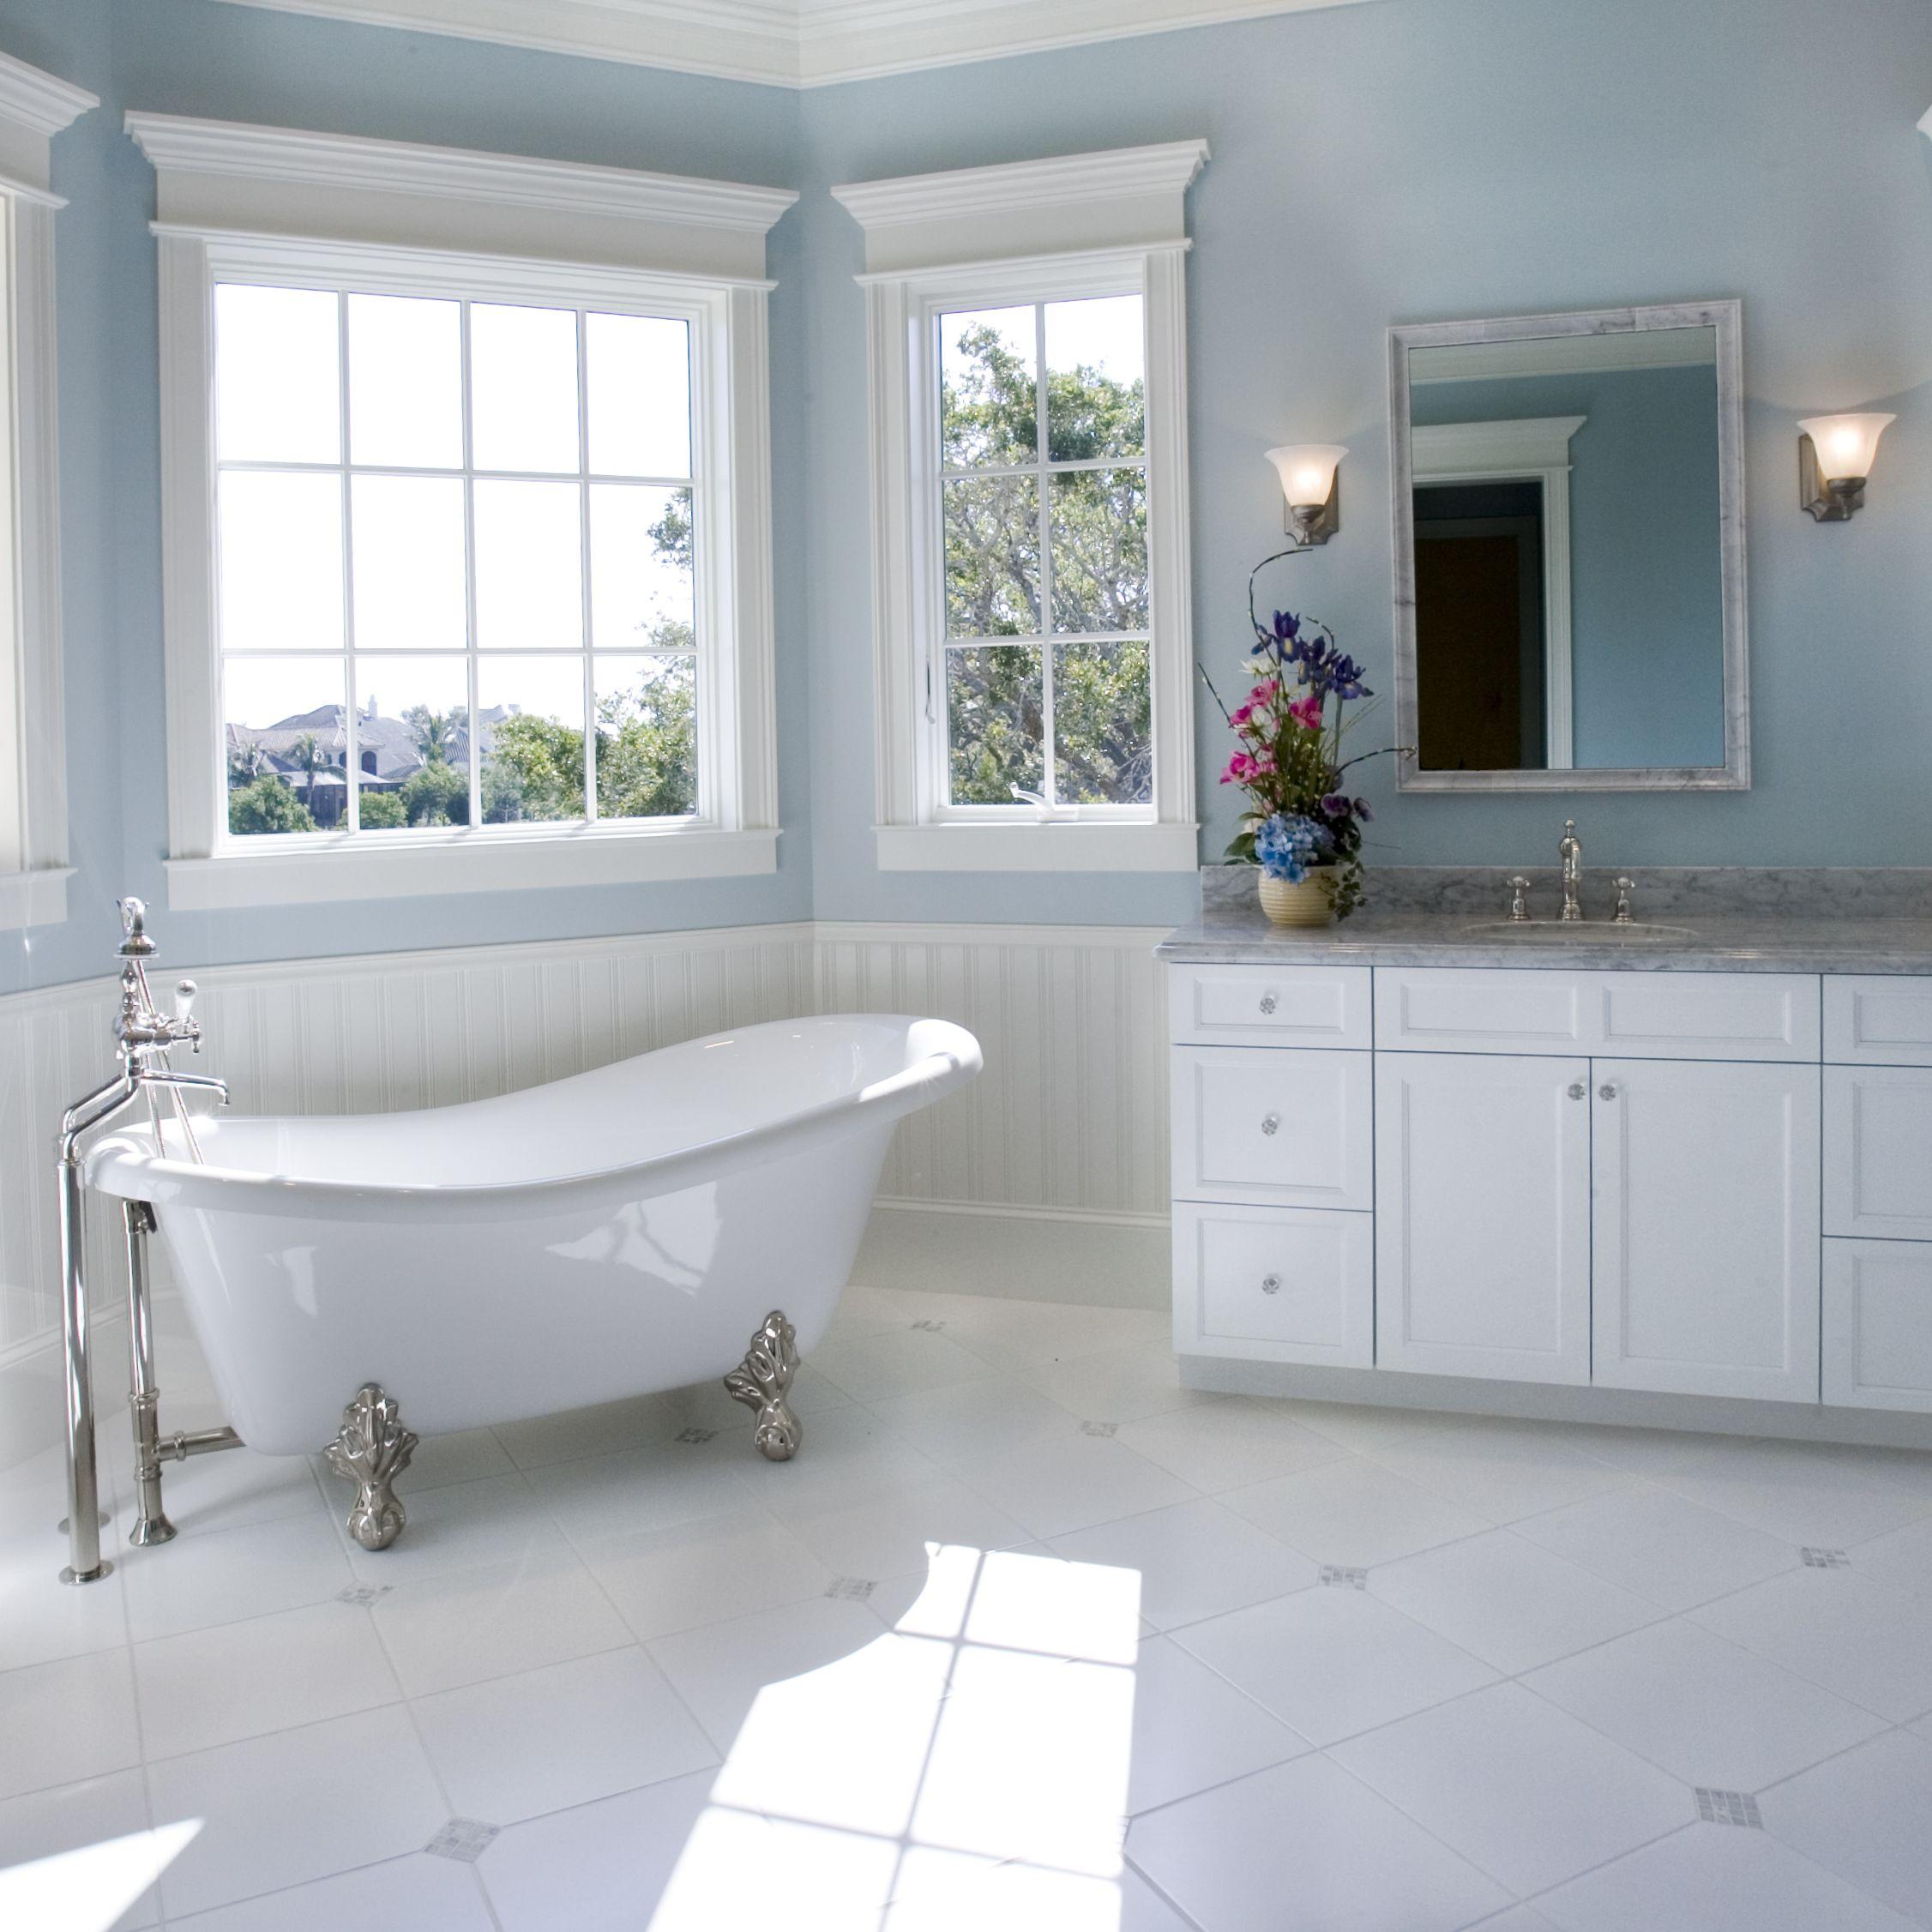 Budget Friendly Bathroom Flooring Options